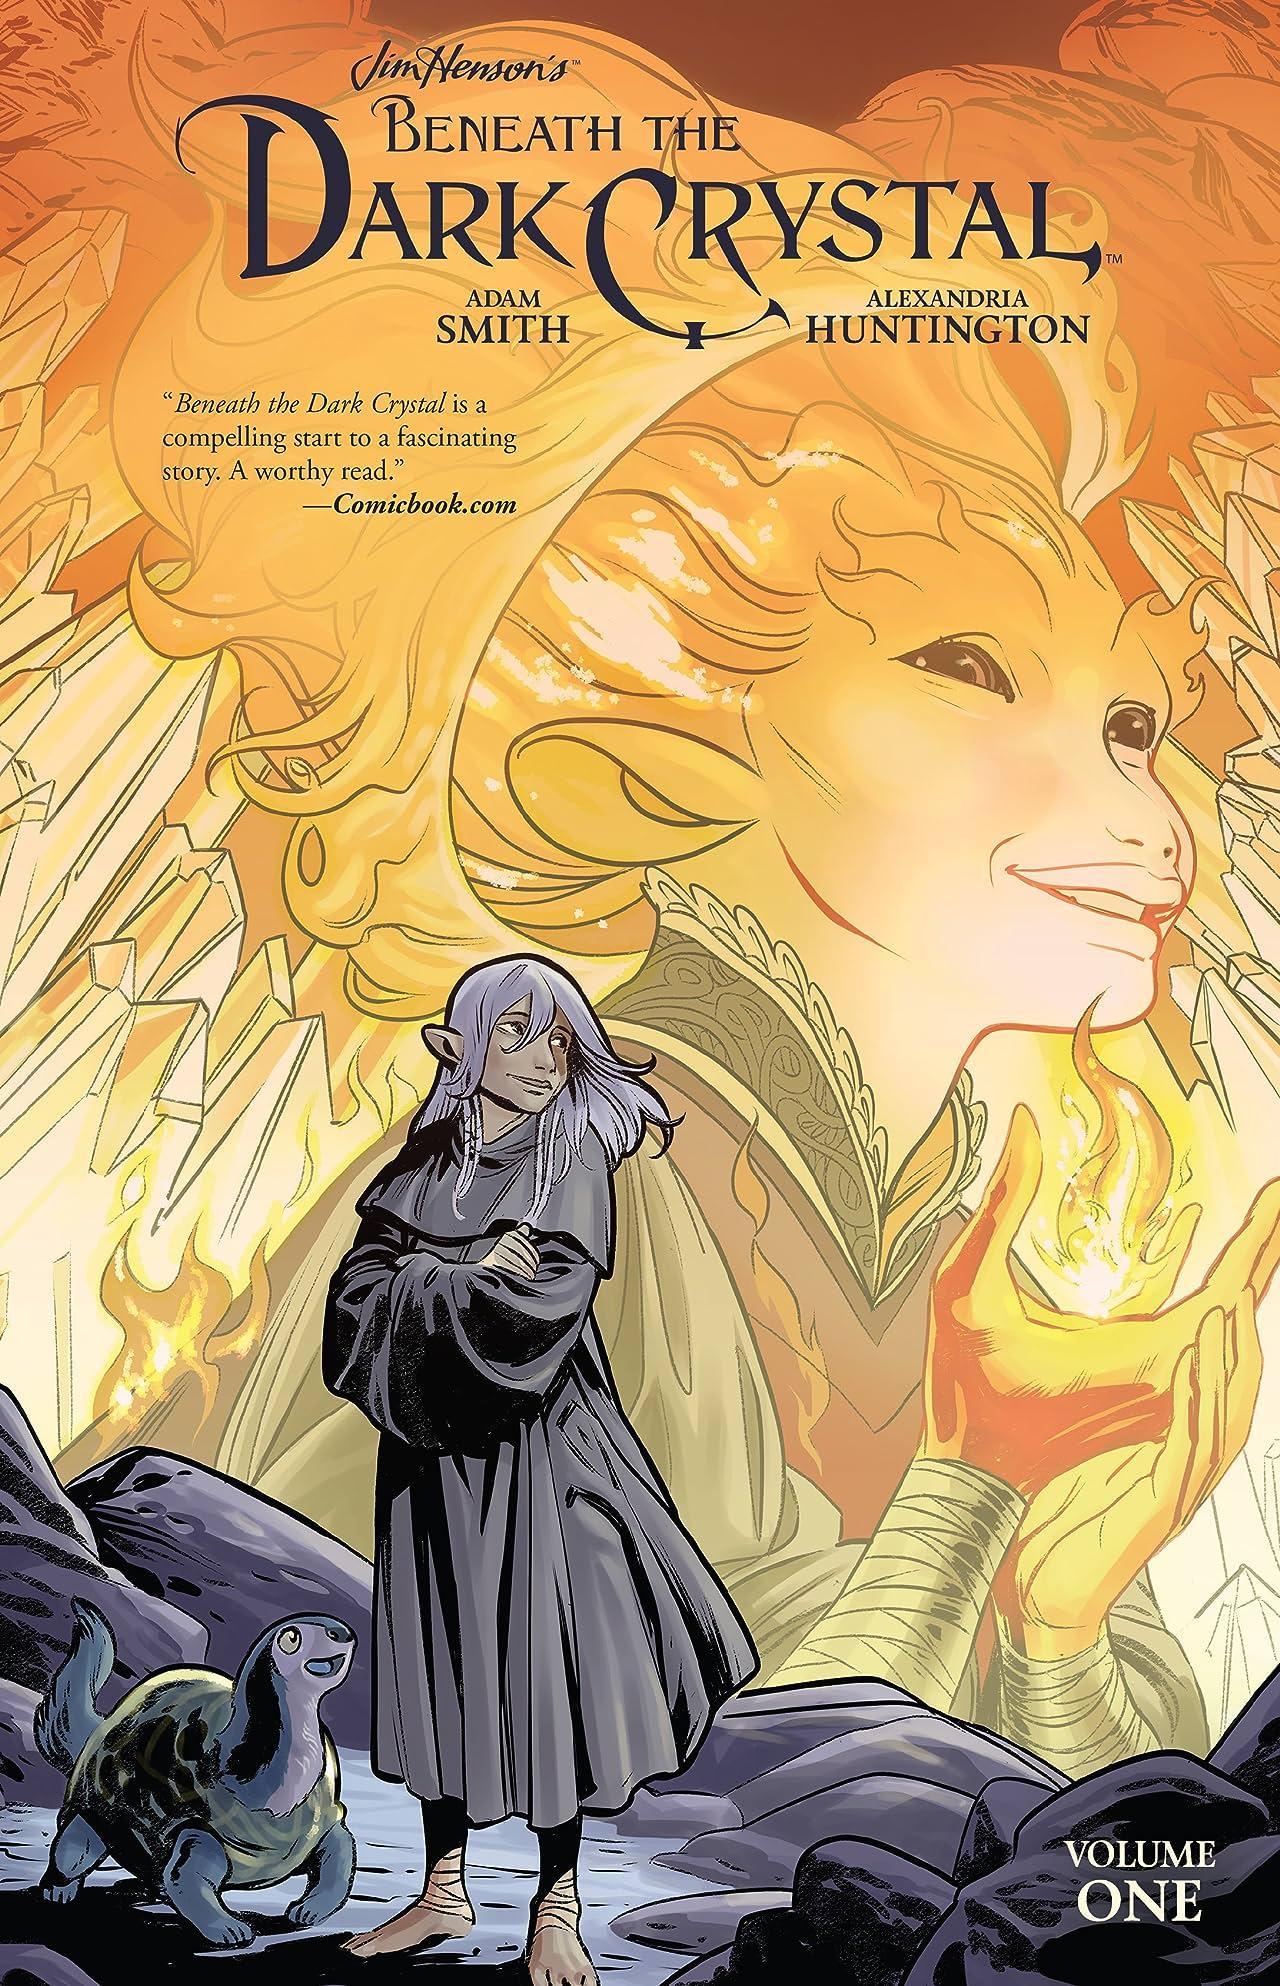 Jim Henson's Beneath the Dark Crystal Vol. 1